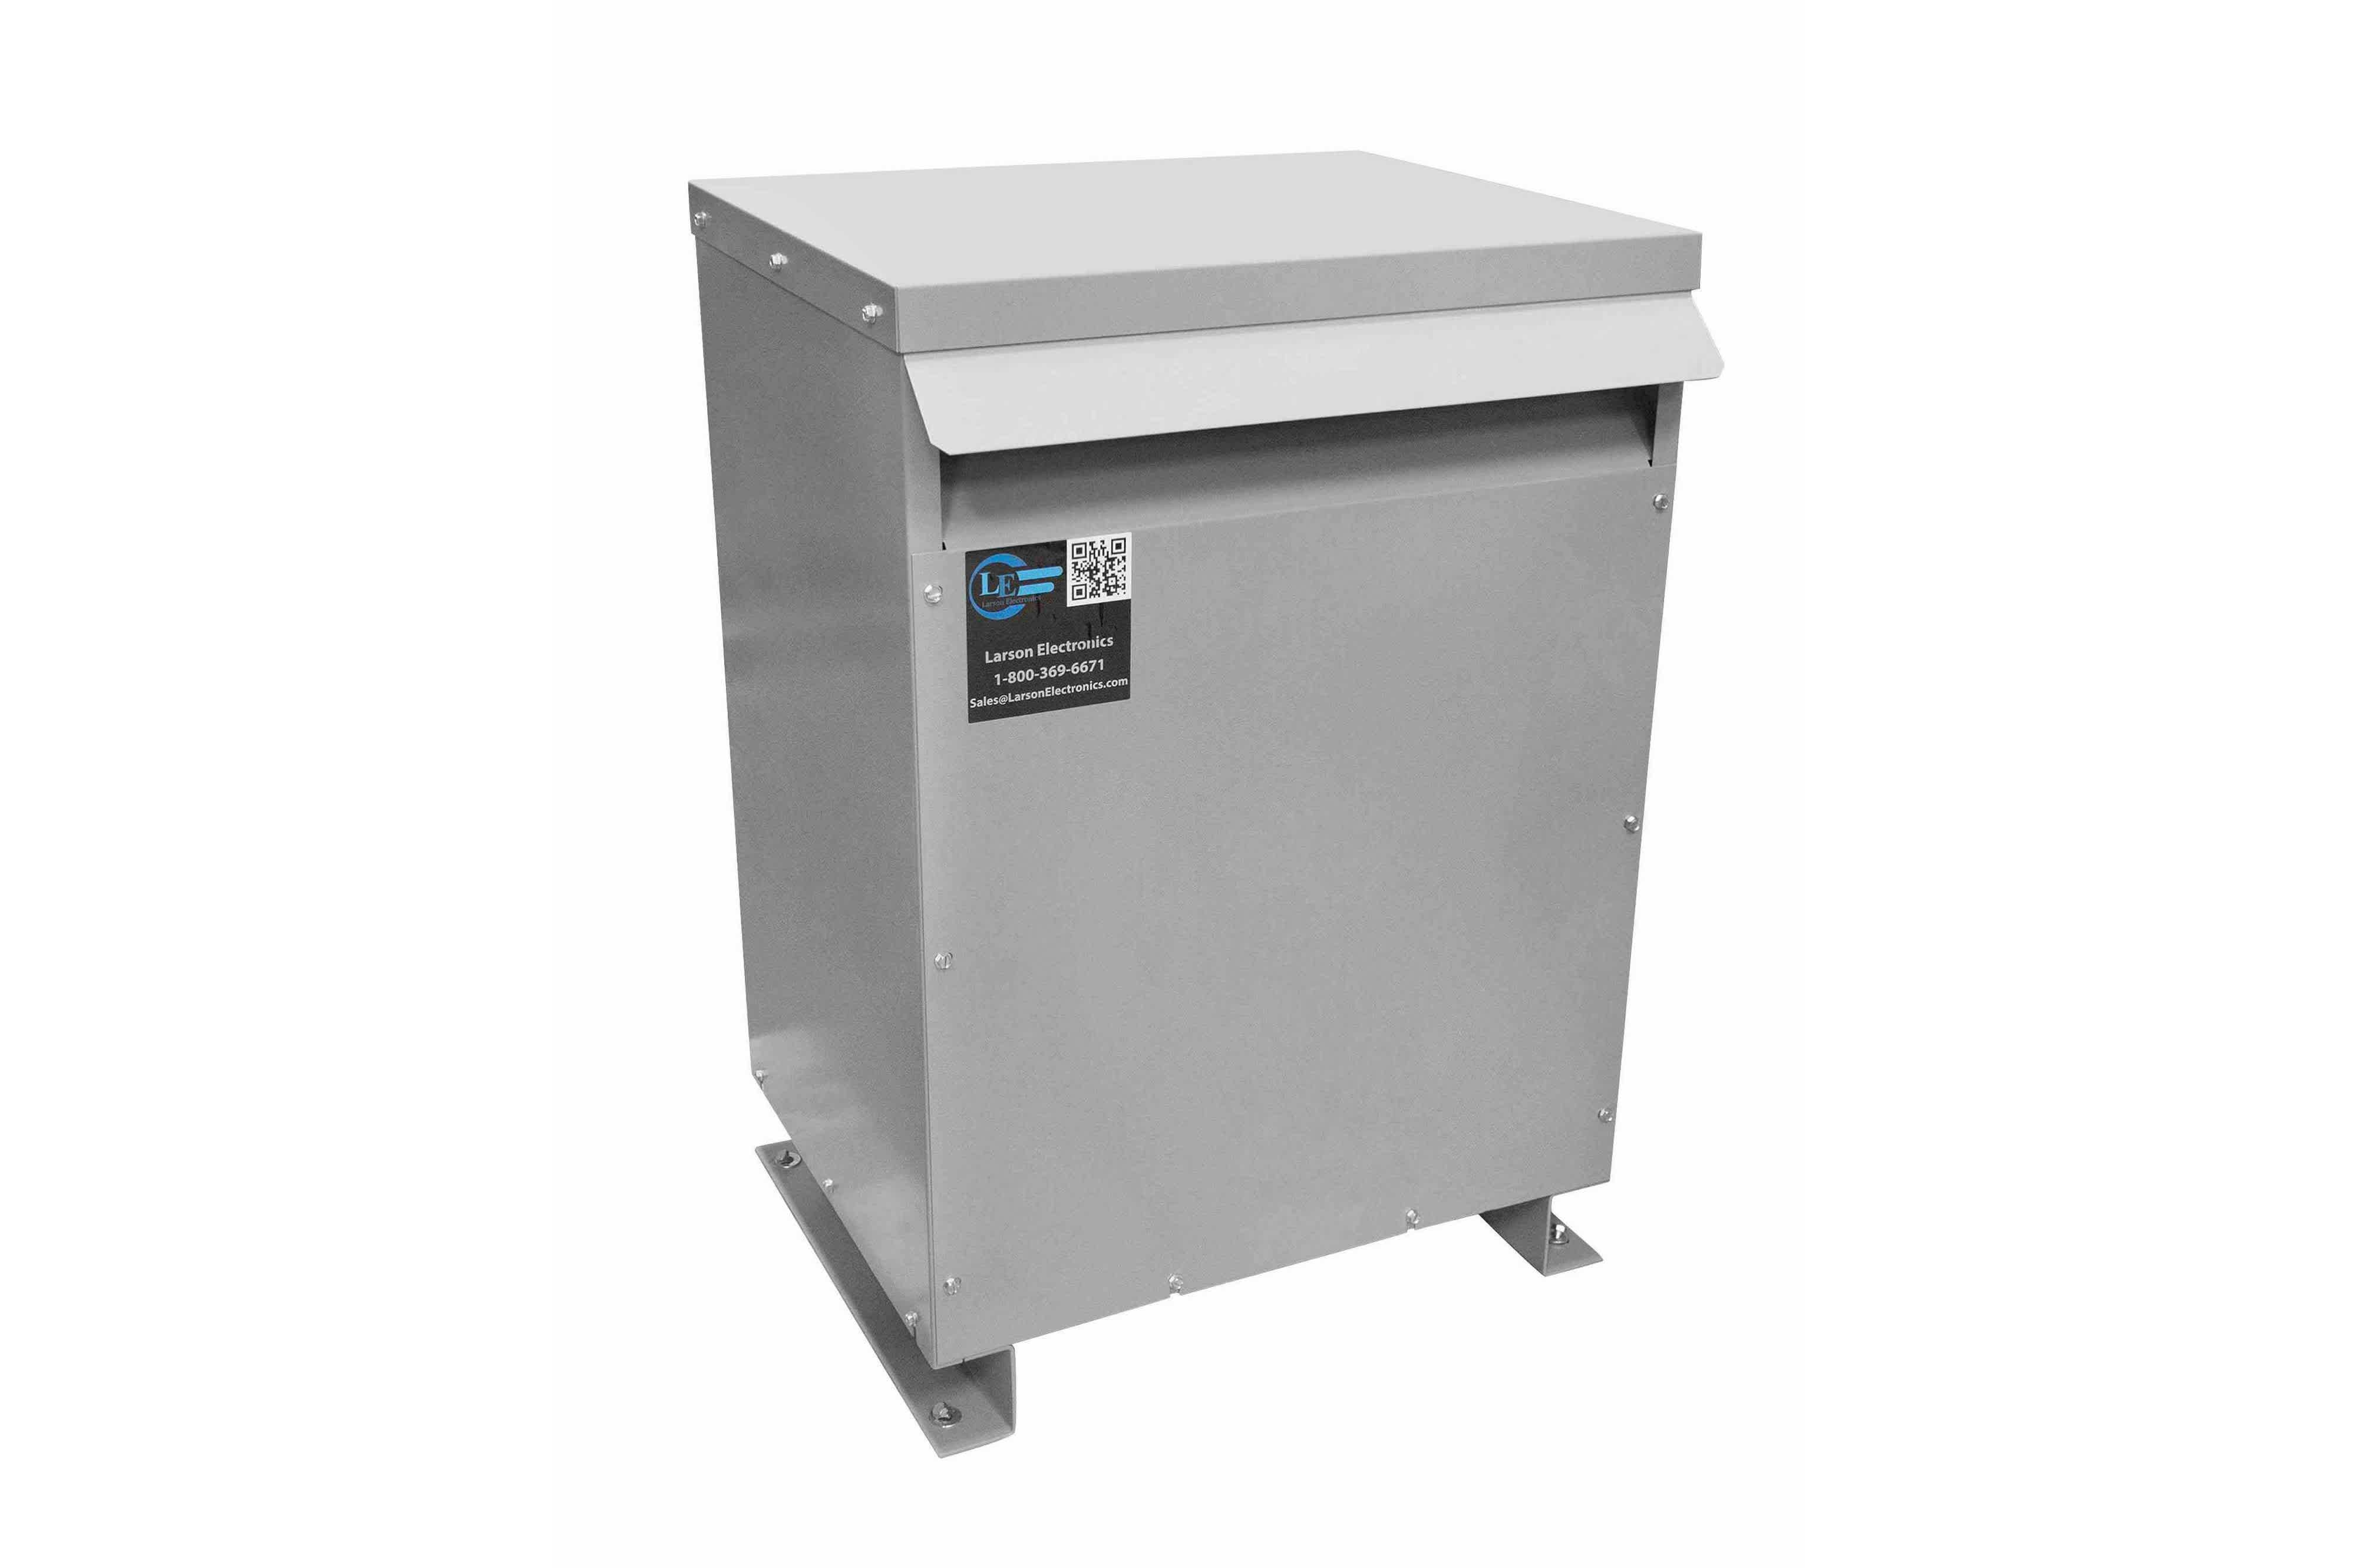 12 kVA 3PH Isolation Transformer, 380V Wye Primary, 240V/120 Delta Secondary, N3R, Ventilated, 60 Hz